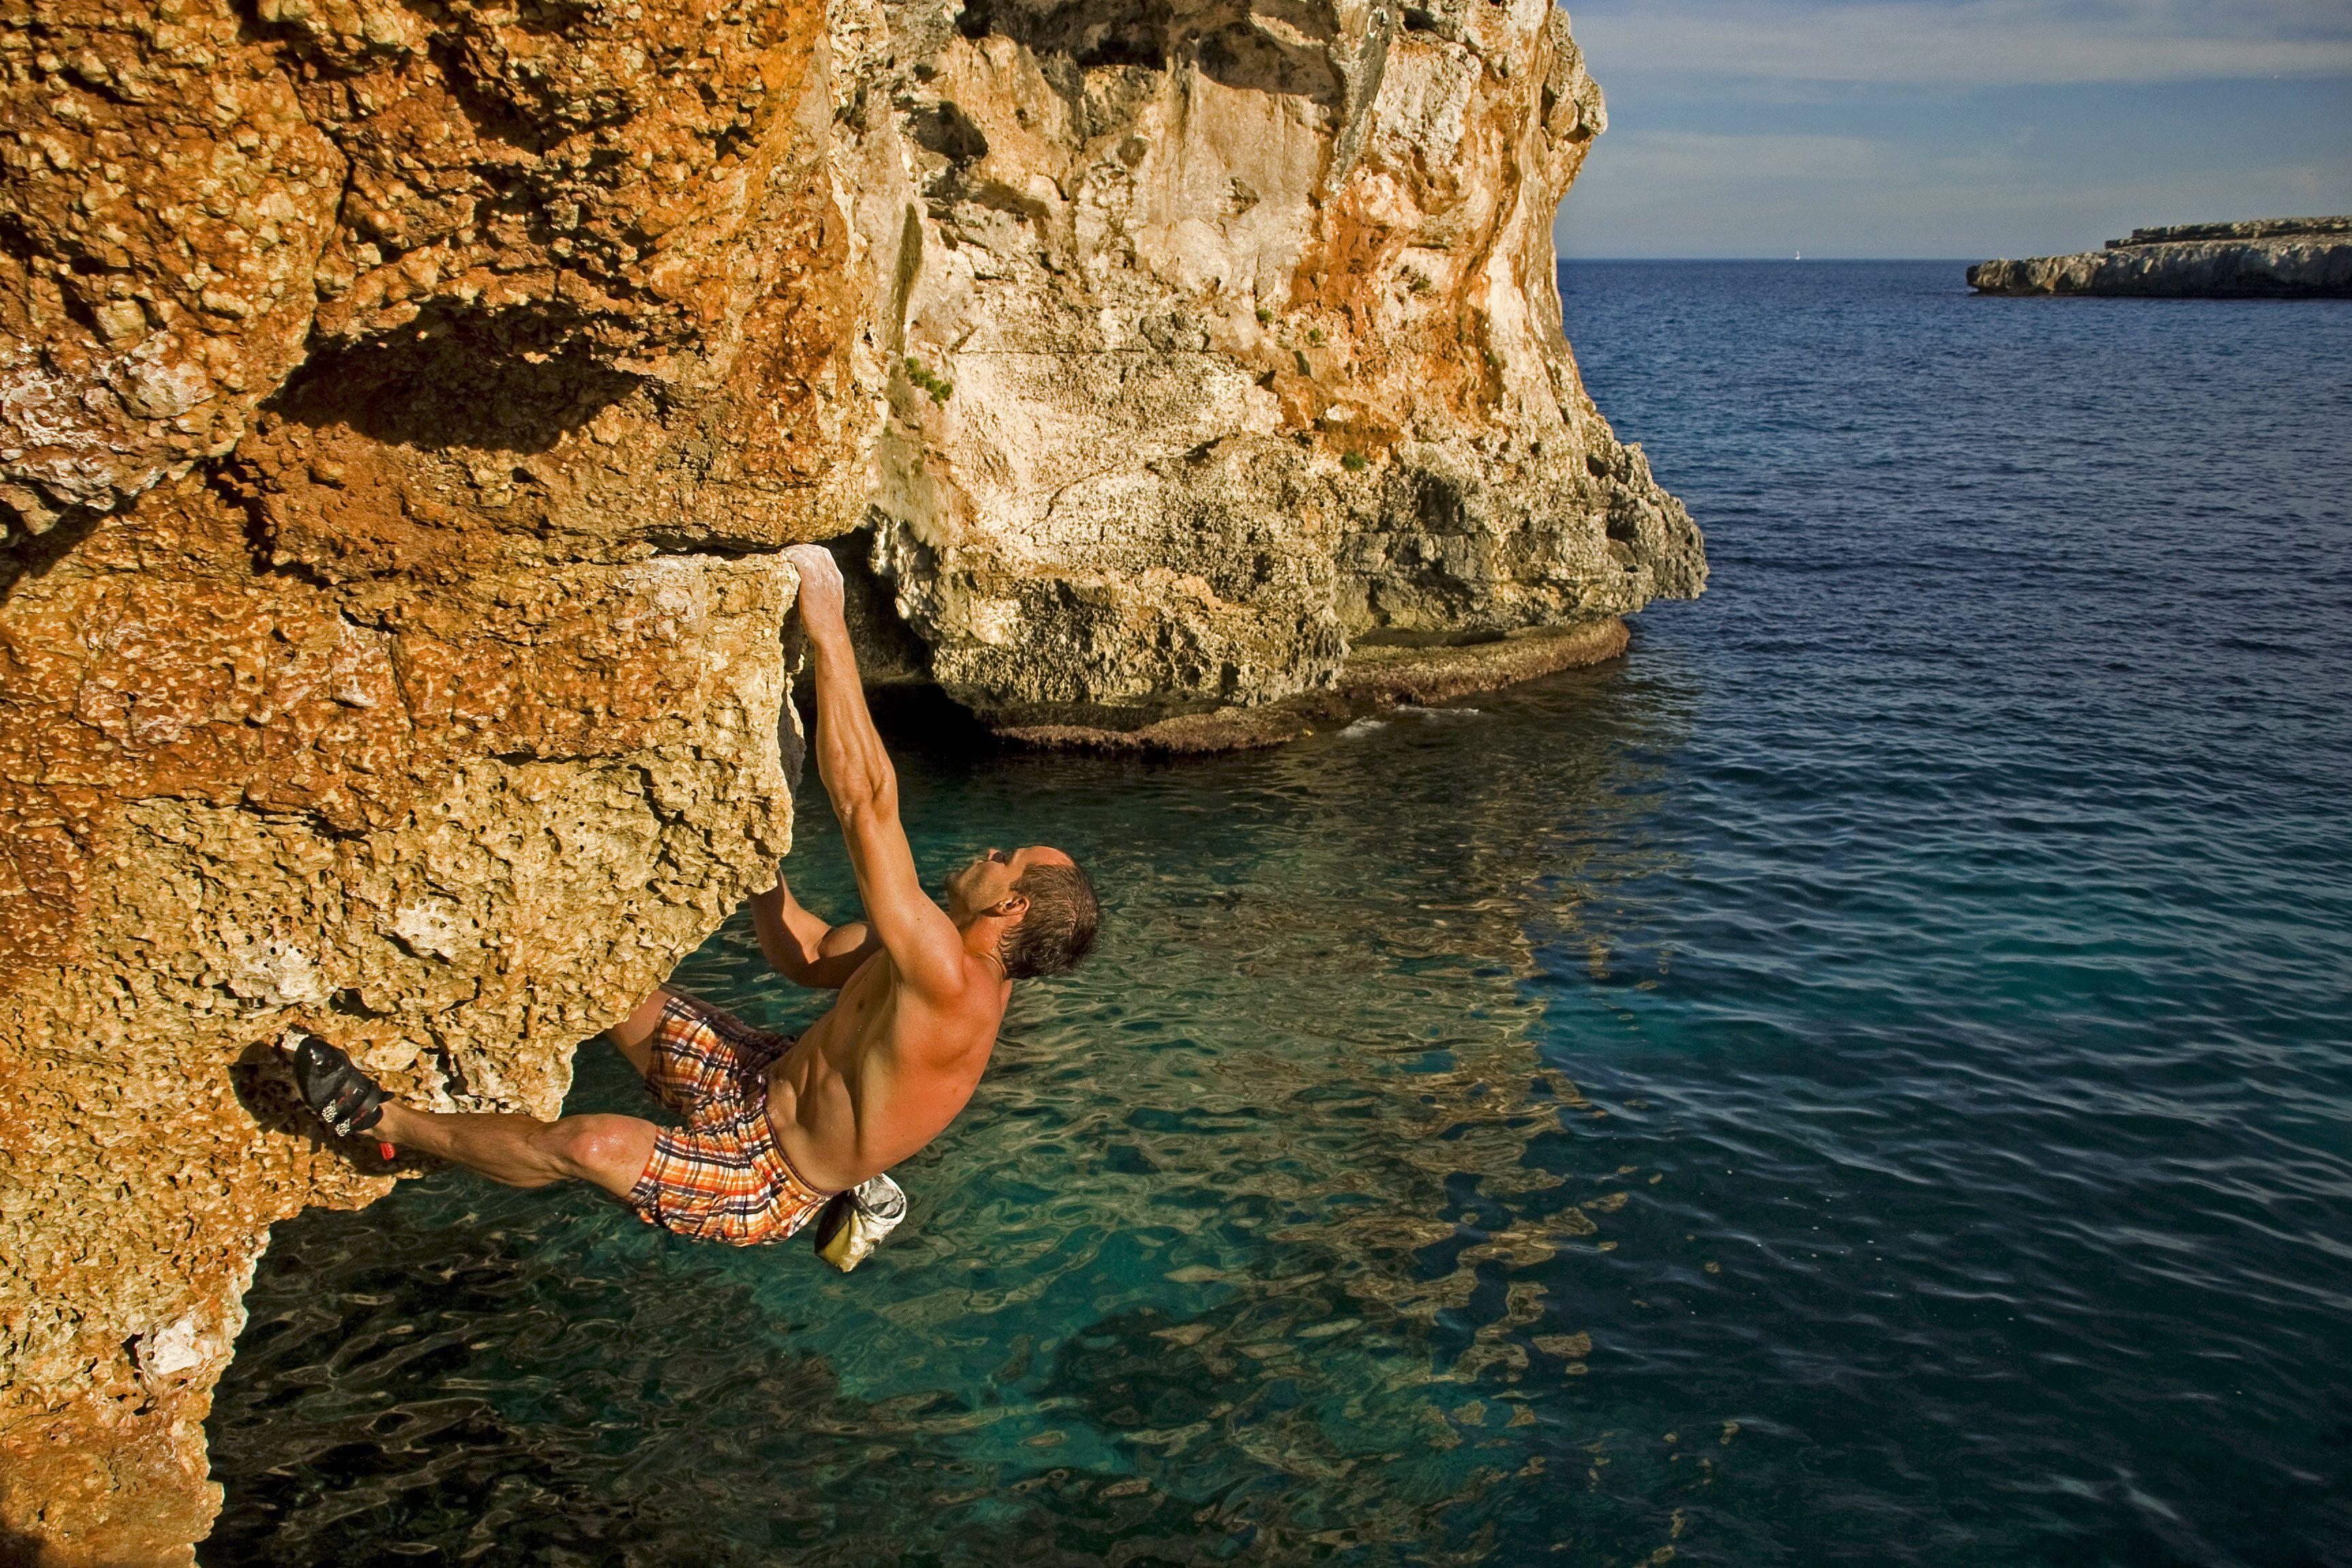 A deep water soloist cracks clean rock above the Mediterranean Sea on the coast of Mallorca.